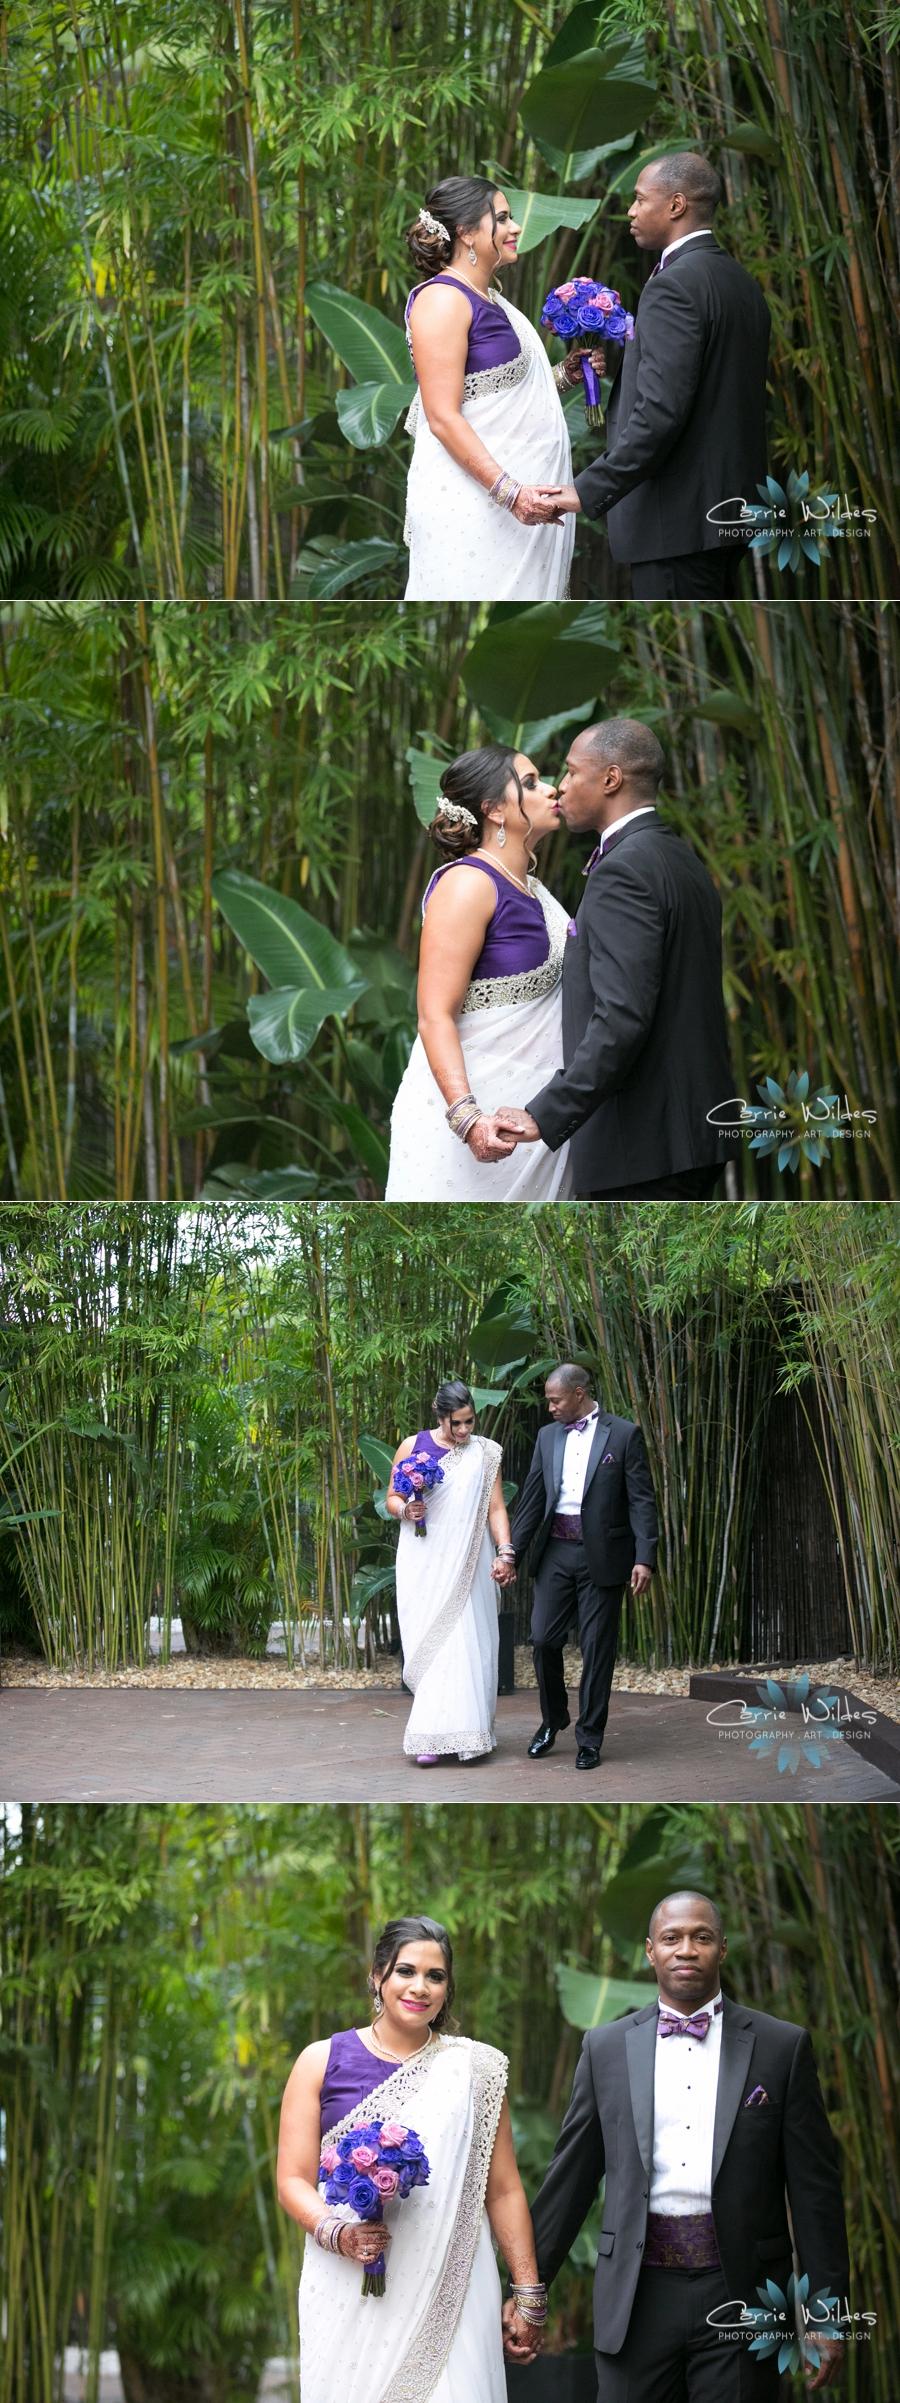 11_4_18 Alia and Jay Nova 535 Wedding_0020.jpg